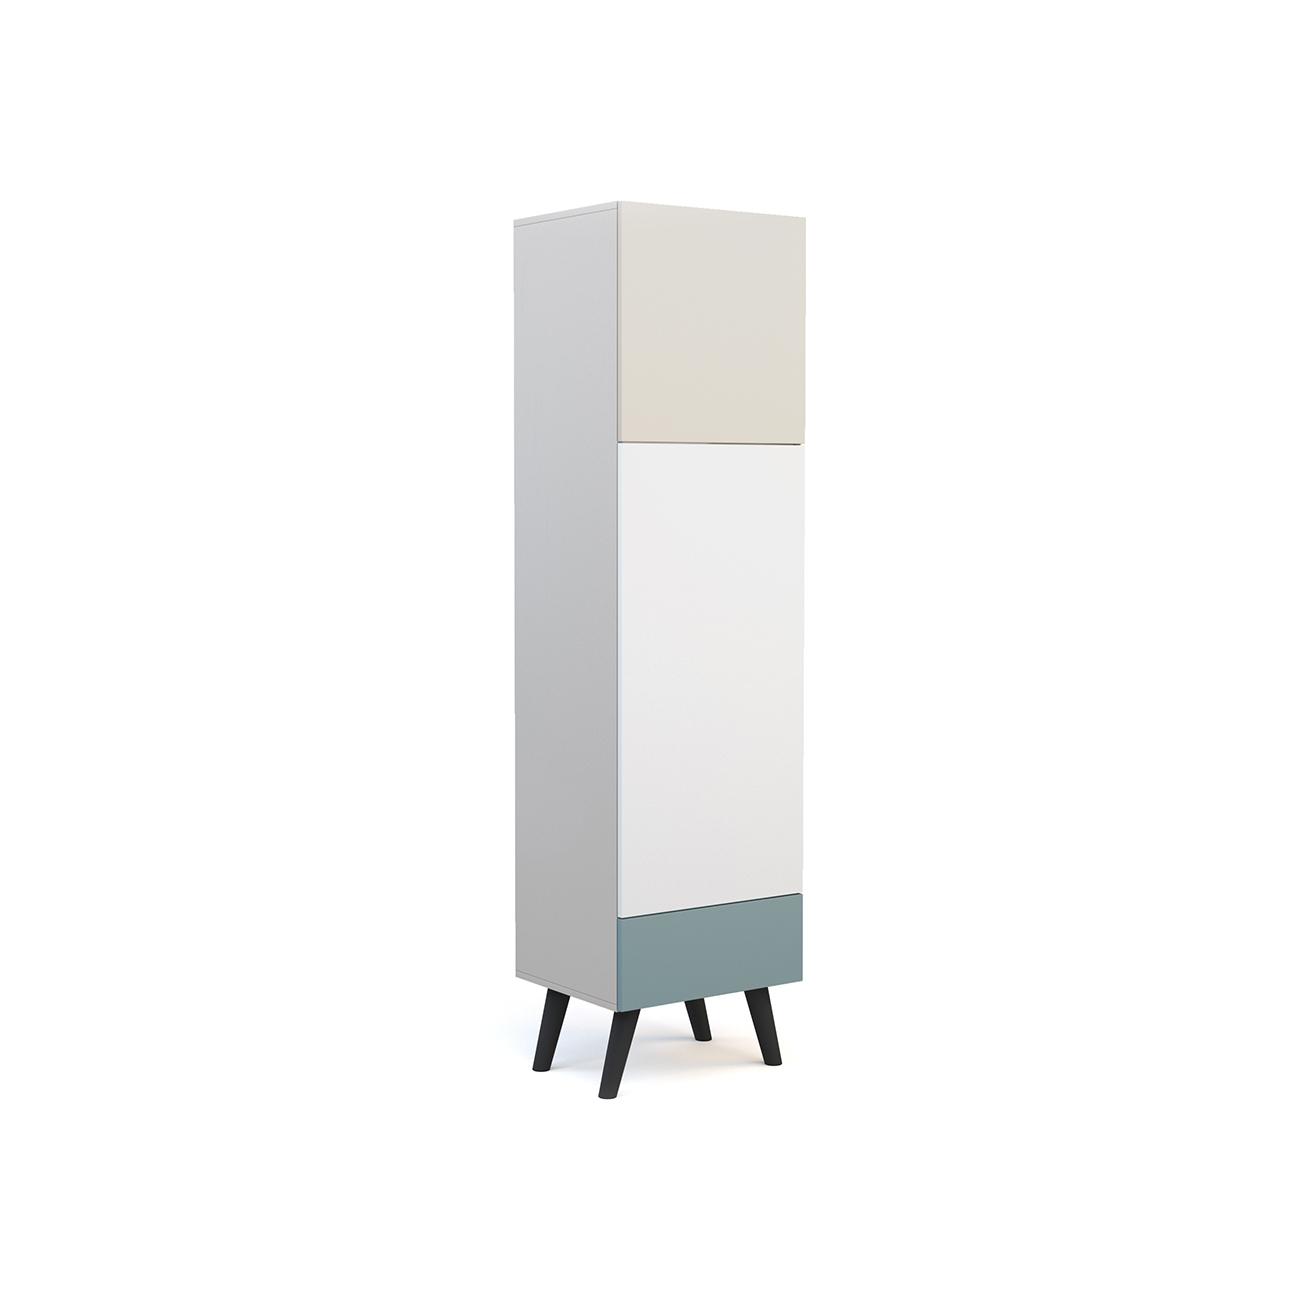 Шкаф galata soft (olhause) серый 50x190x40 см.